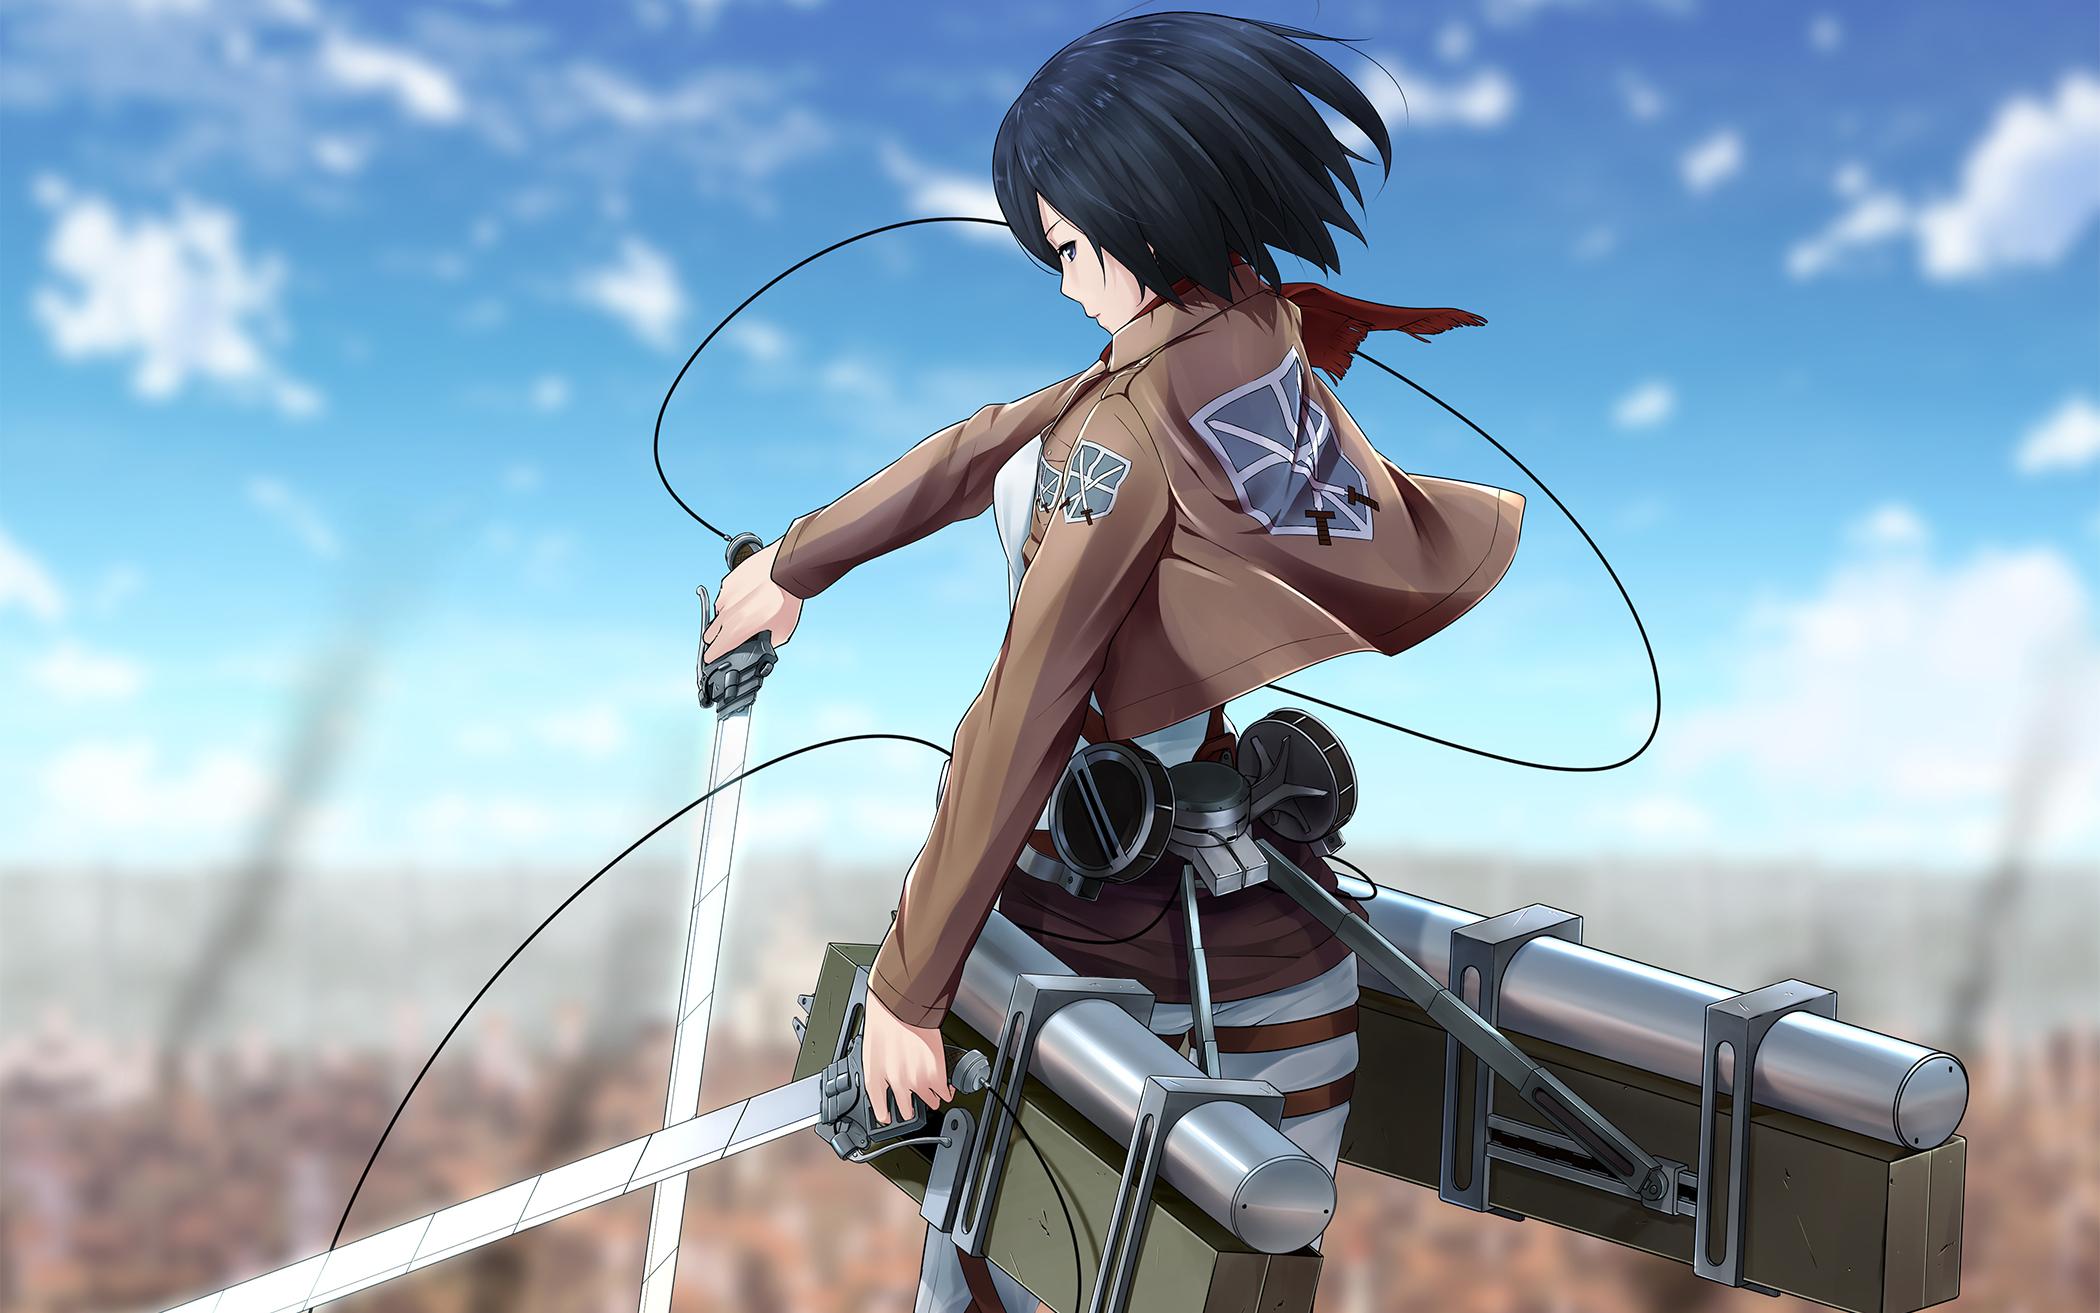 no kyojin mikasa ackerman ninnzinn sword weapon wallpaper background 2100x1313